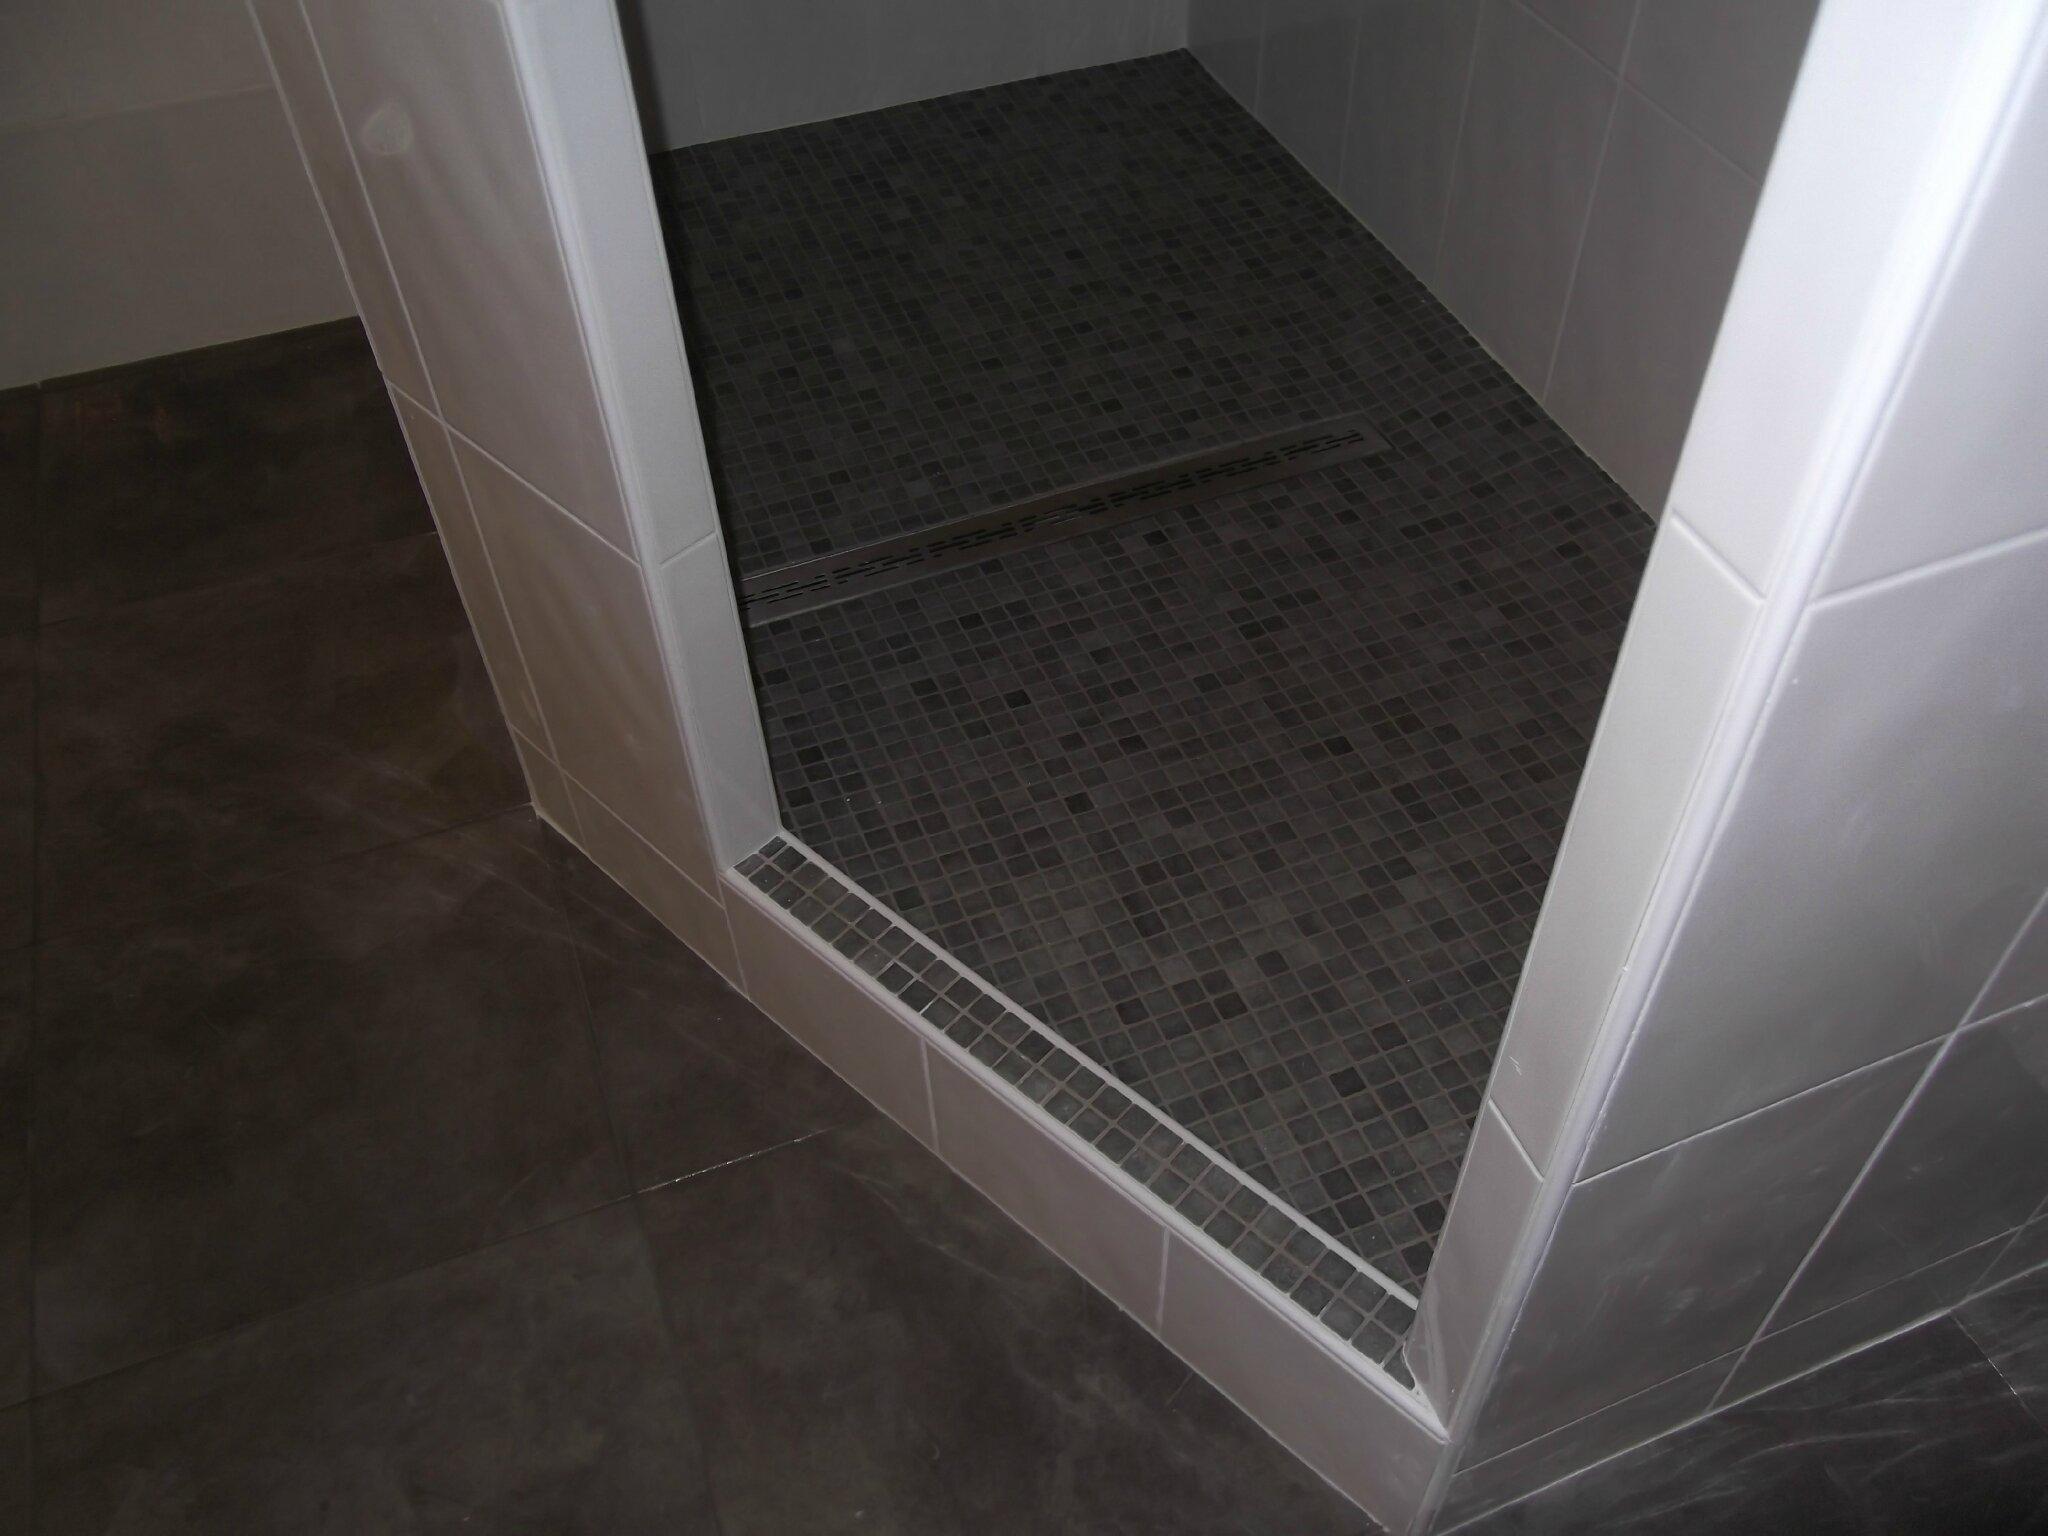 suite renovation douche hors sol carrelagebommart. Black Bedroom Furniture Sets. Home Design Ideas